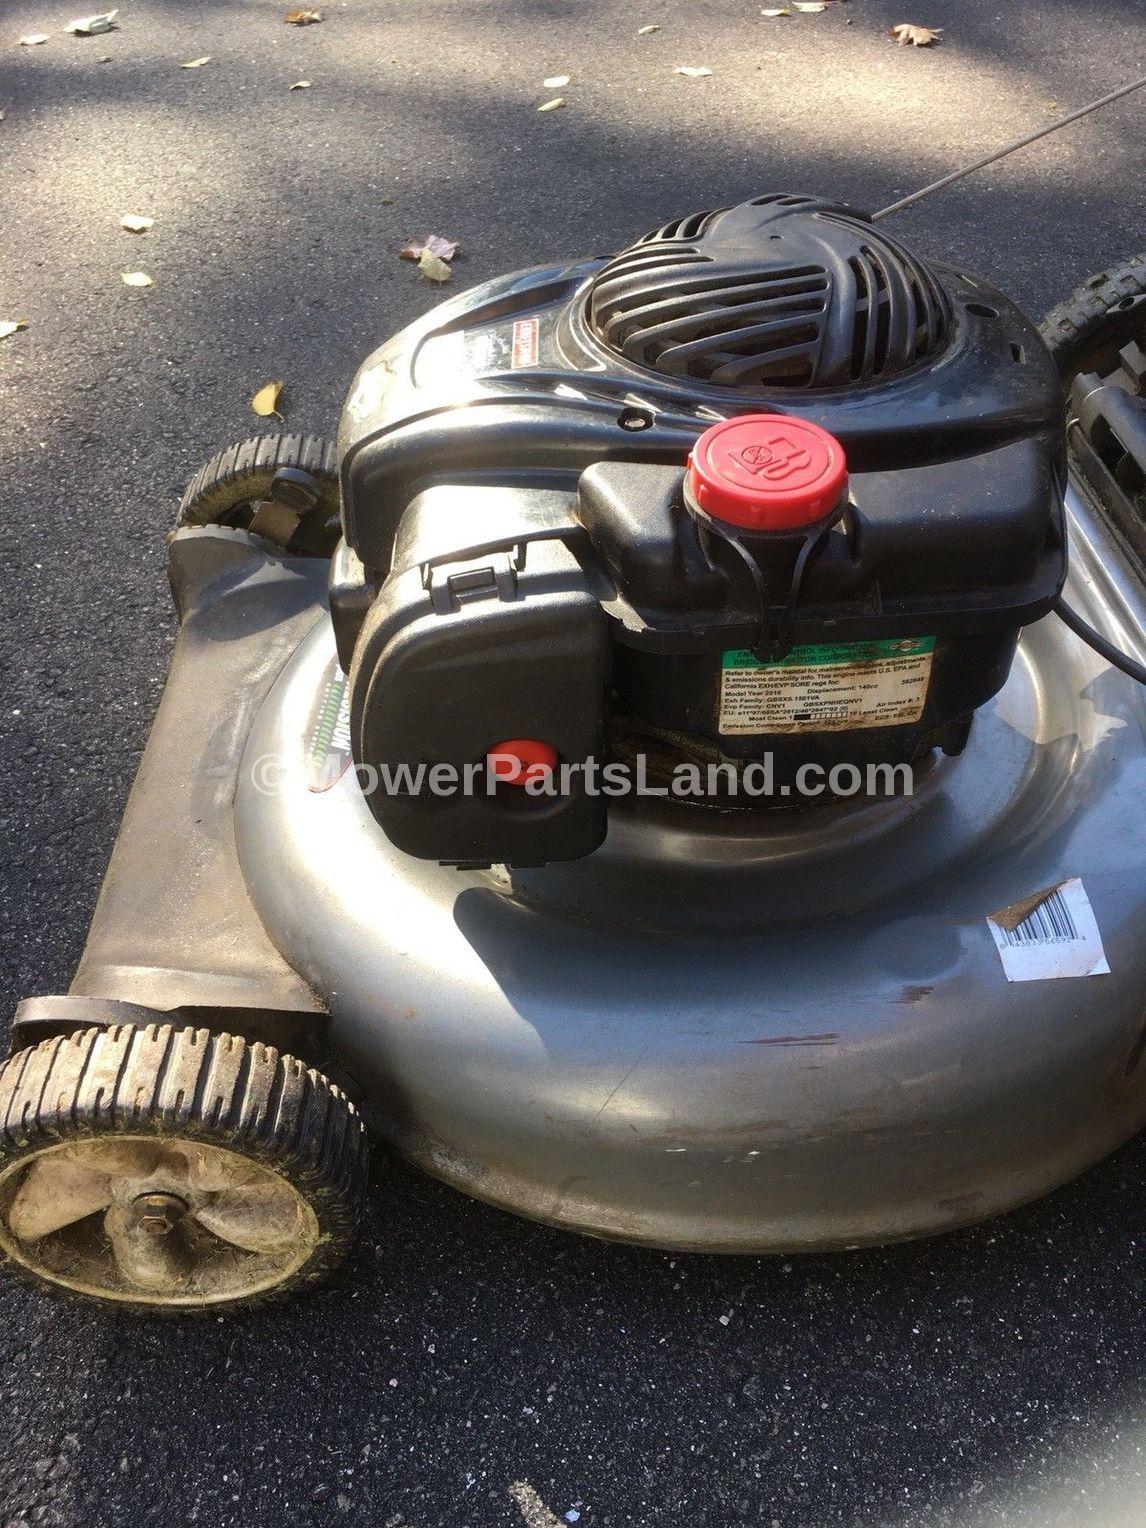 Craftsman Model Lawn Mower Parts on Mtd Yard Man Tiller Parts